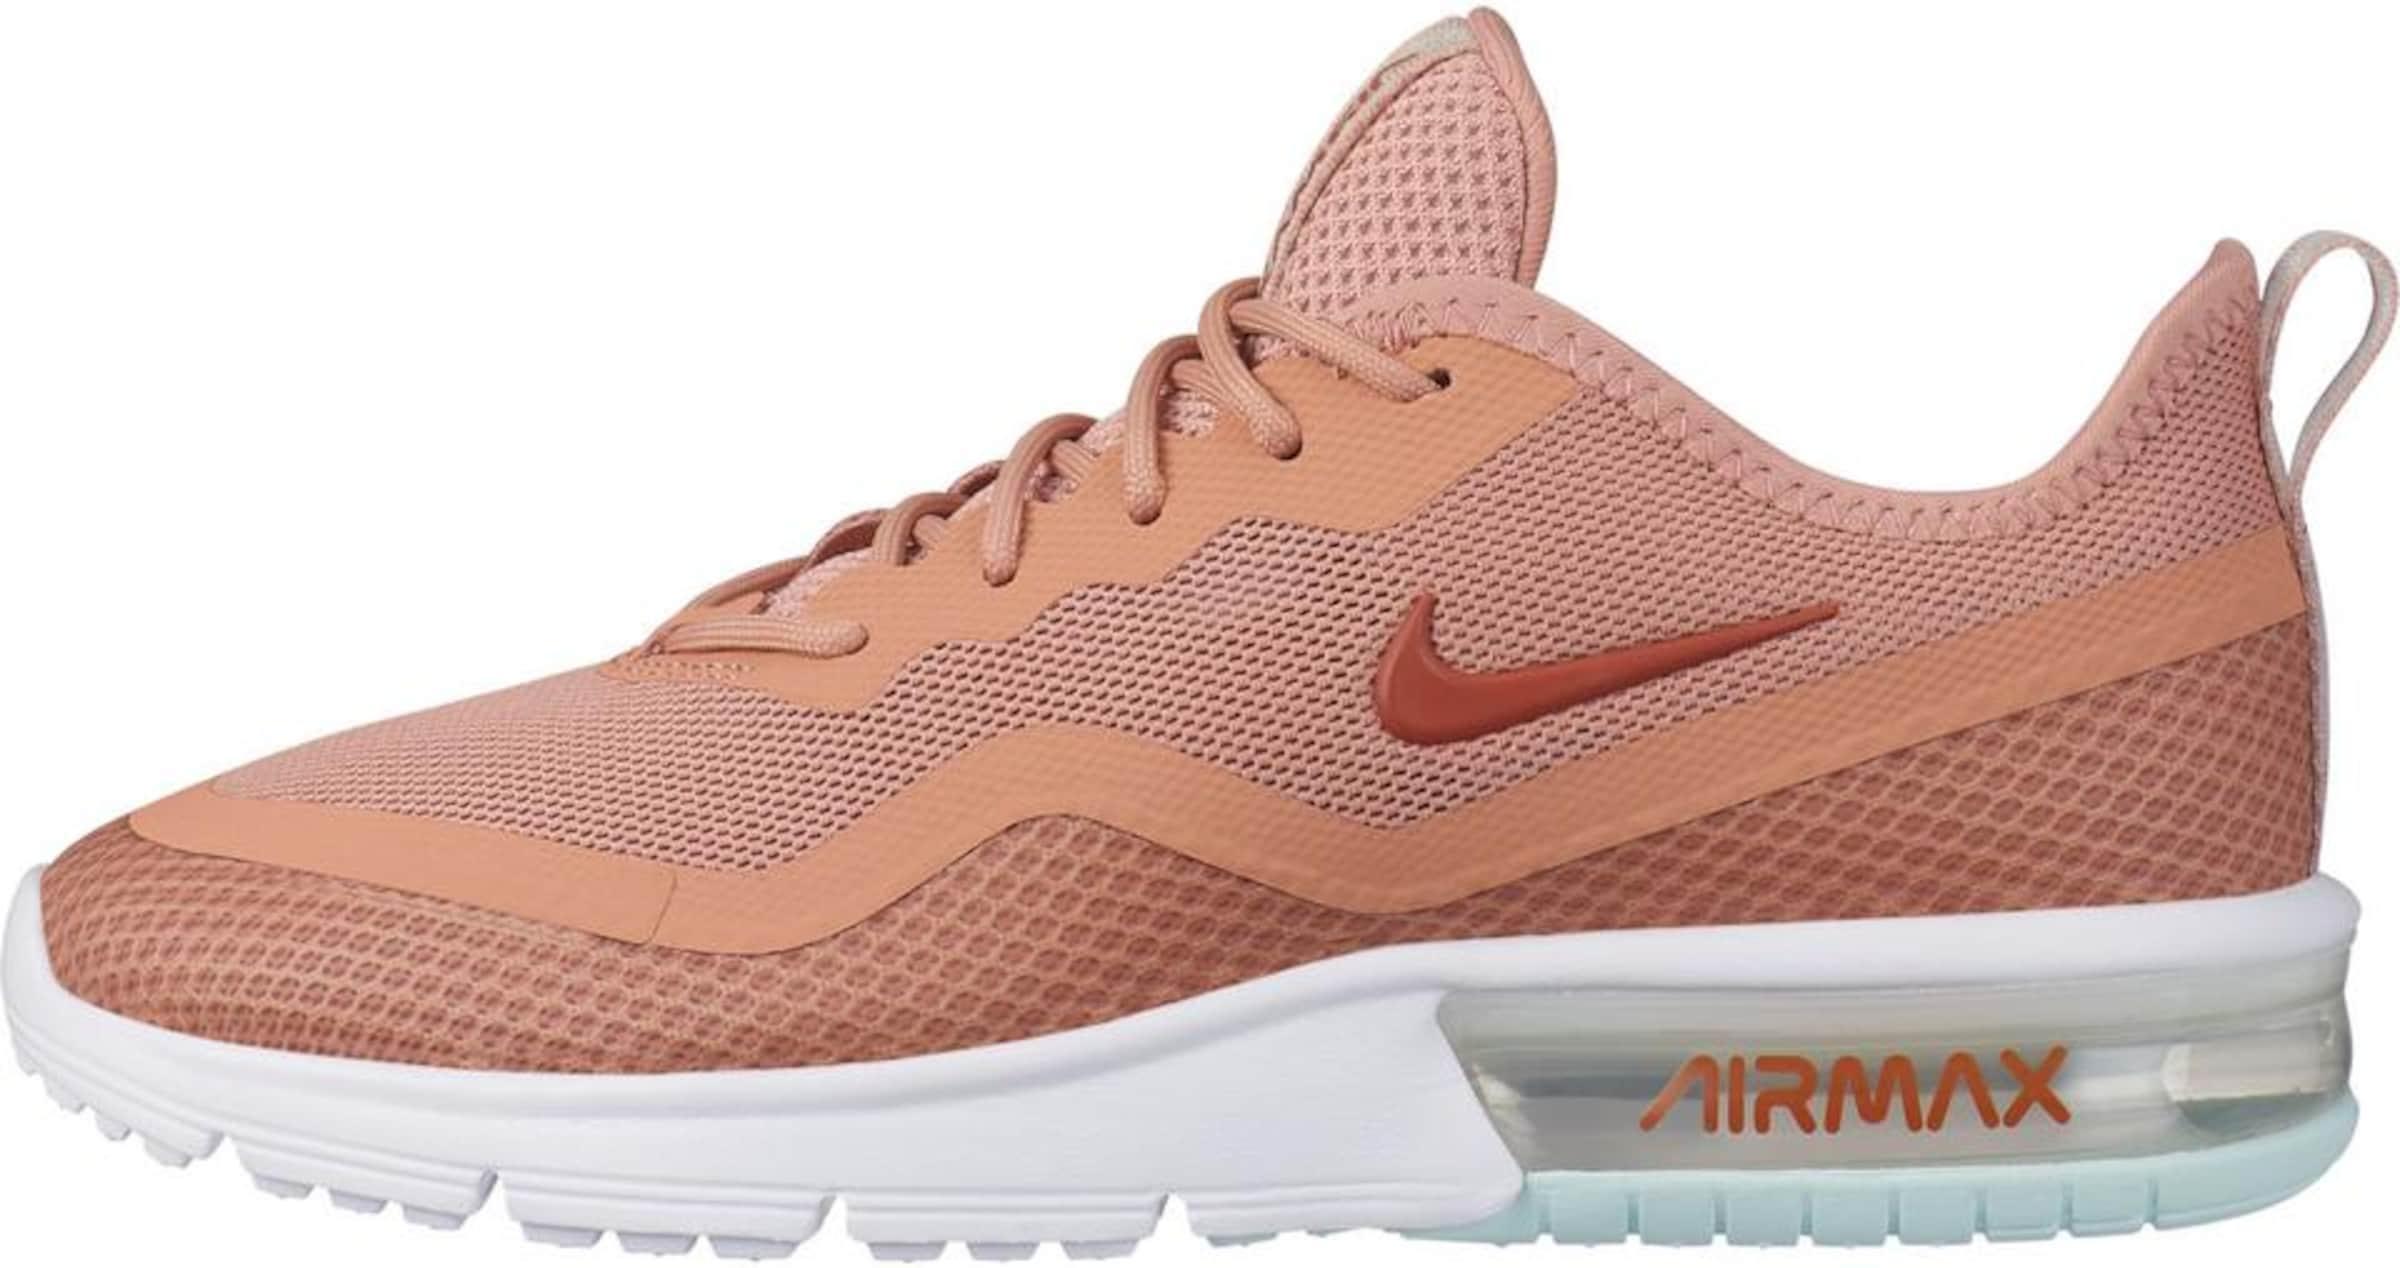 'wmns Nike Sneaker Sequent Sportswear 5' RostrotPastellrot Max Air 4 In yOvmn80Nw